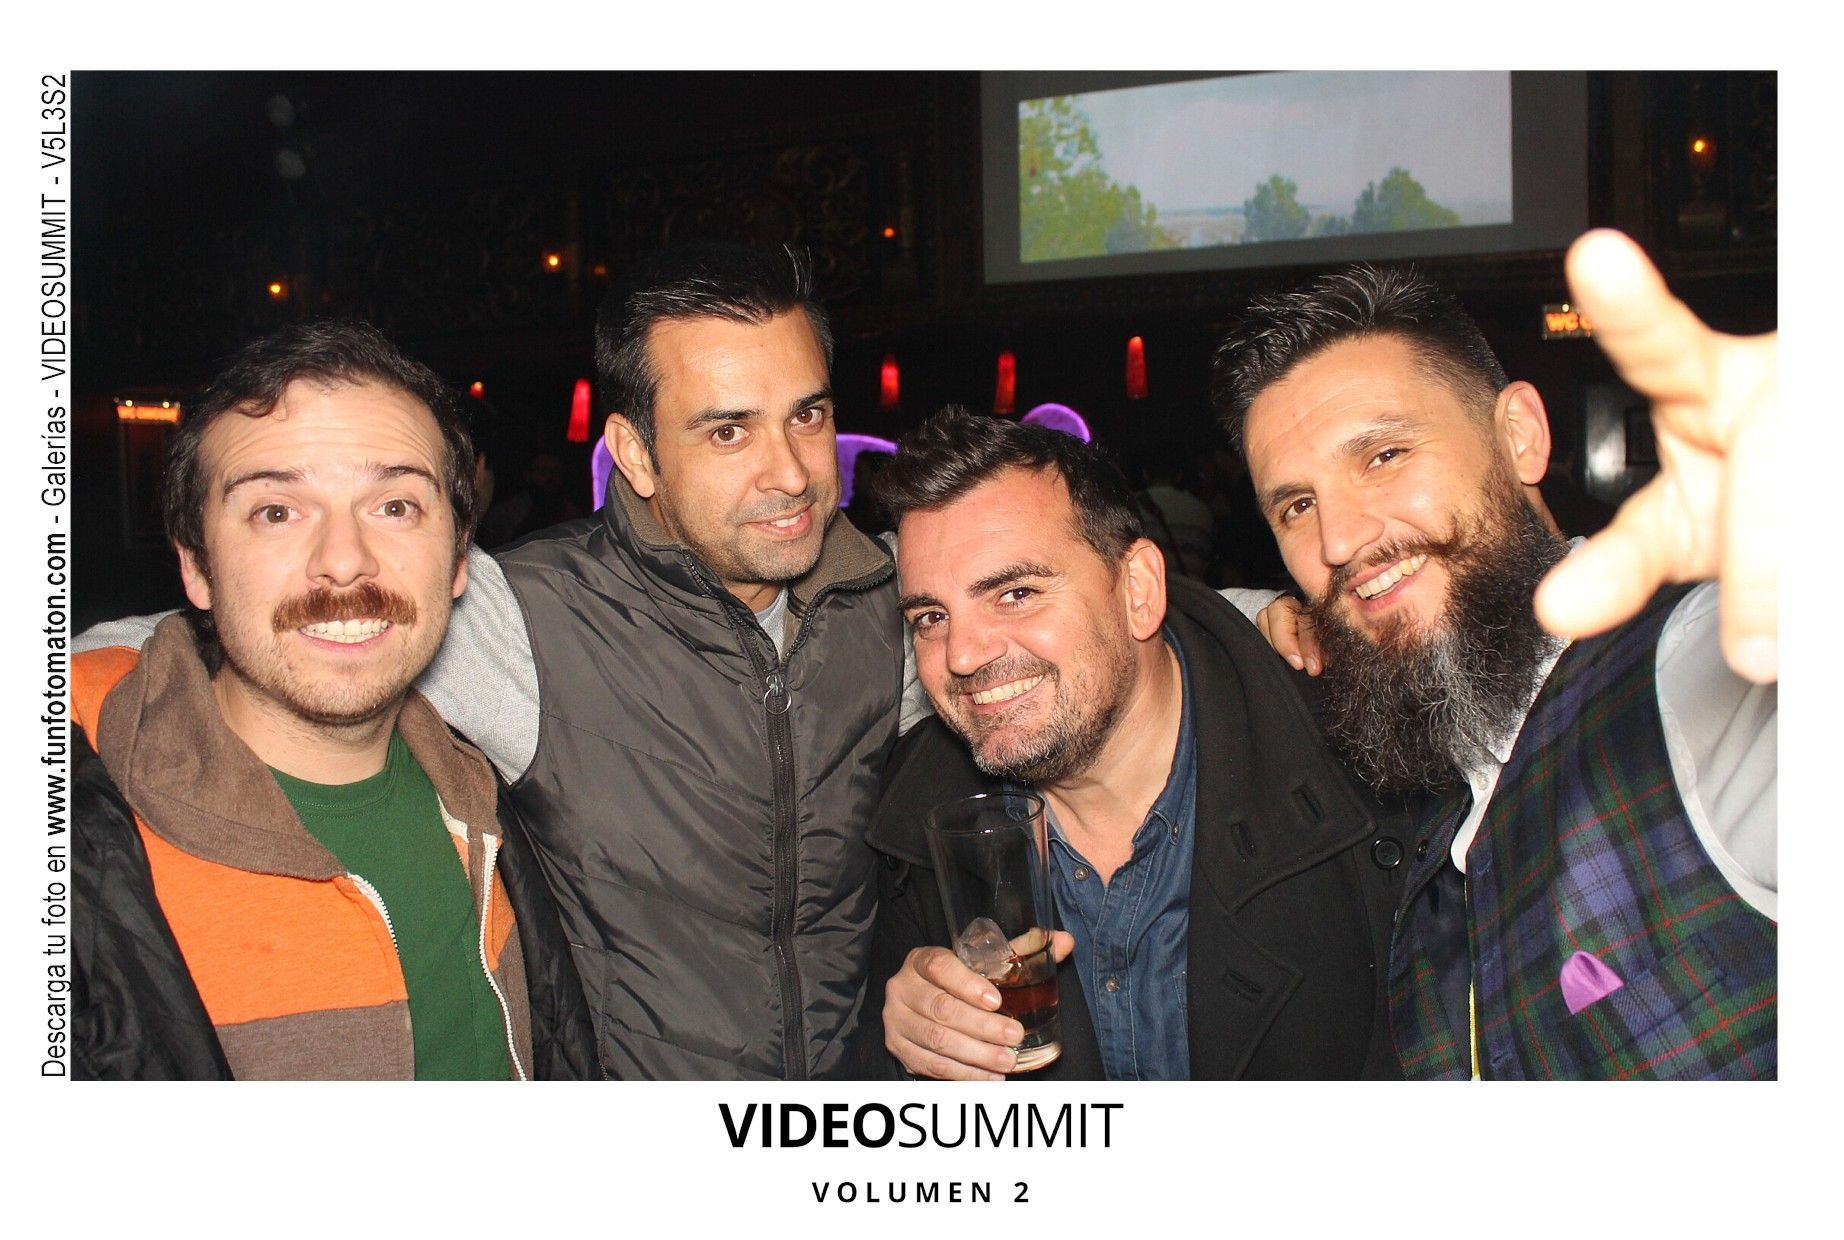 videosummit-vol2-club-party-013